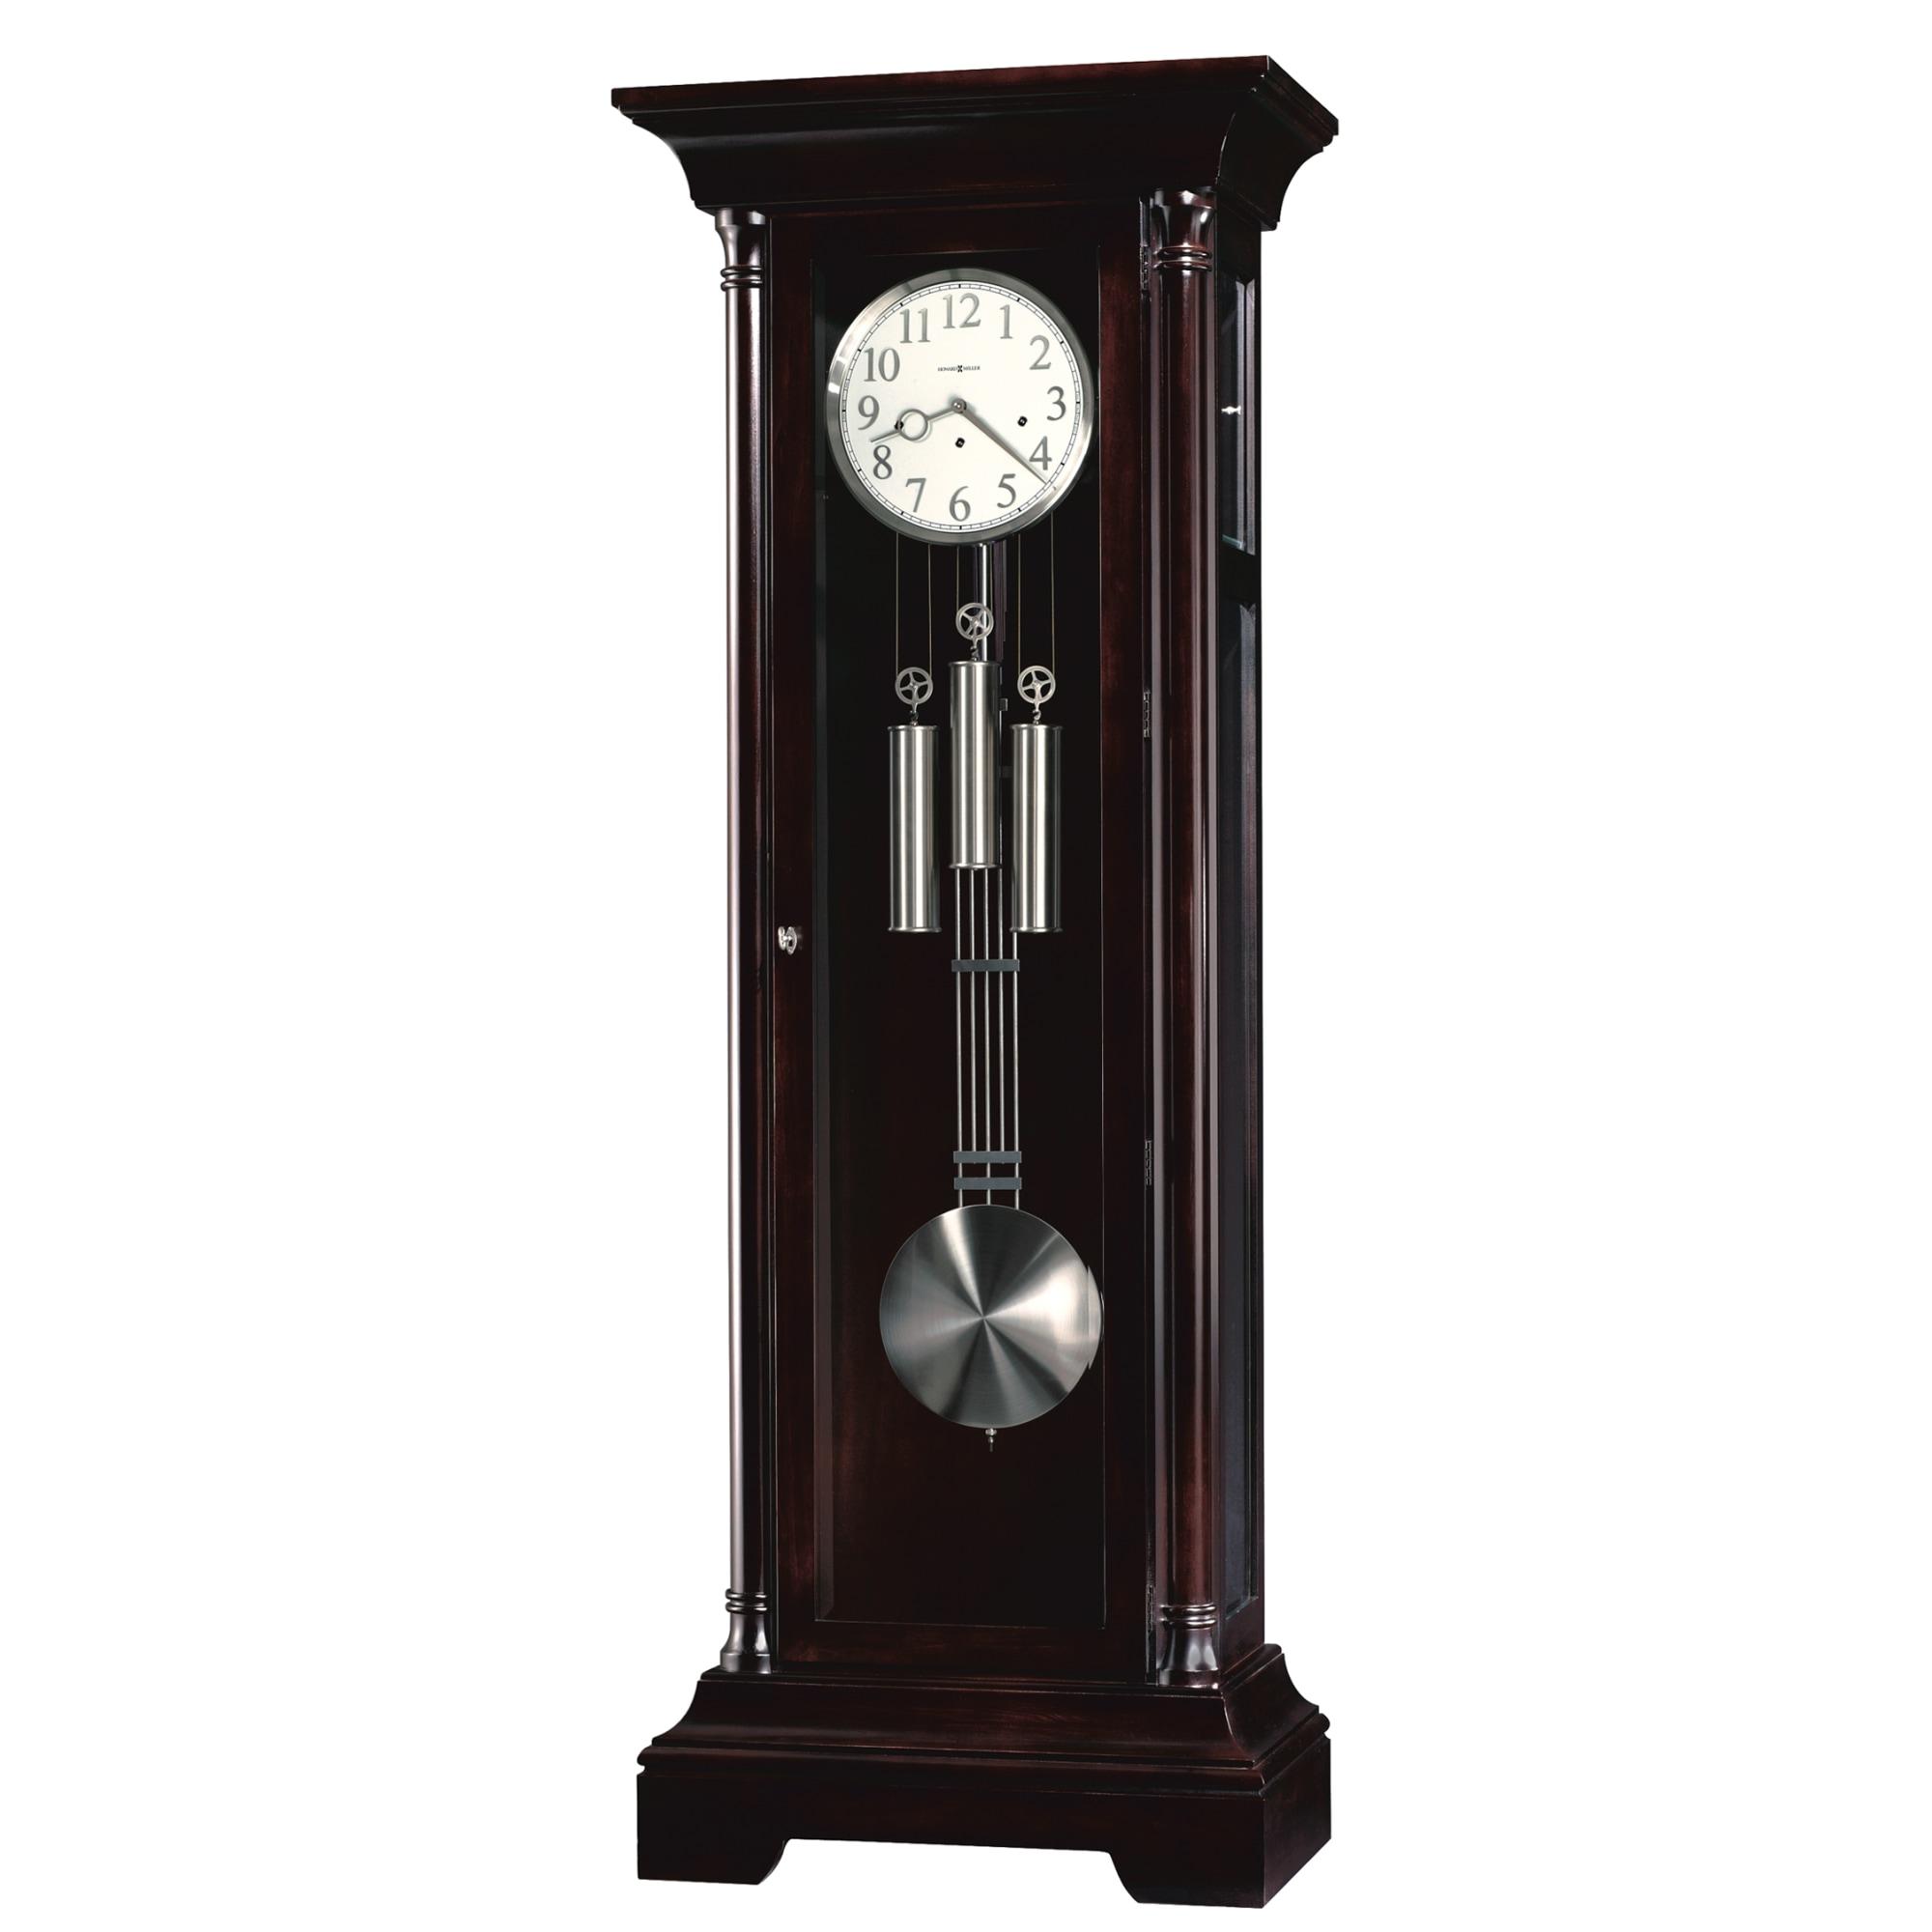 Image for Howard Miller Seville Wooden Floor Clock 611032 from Howard Miller Official Website